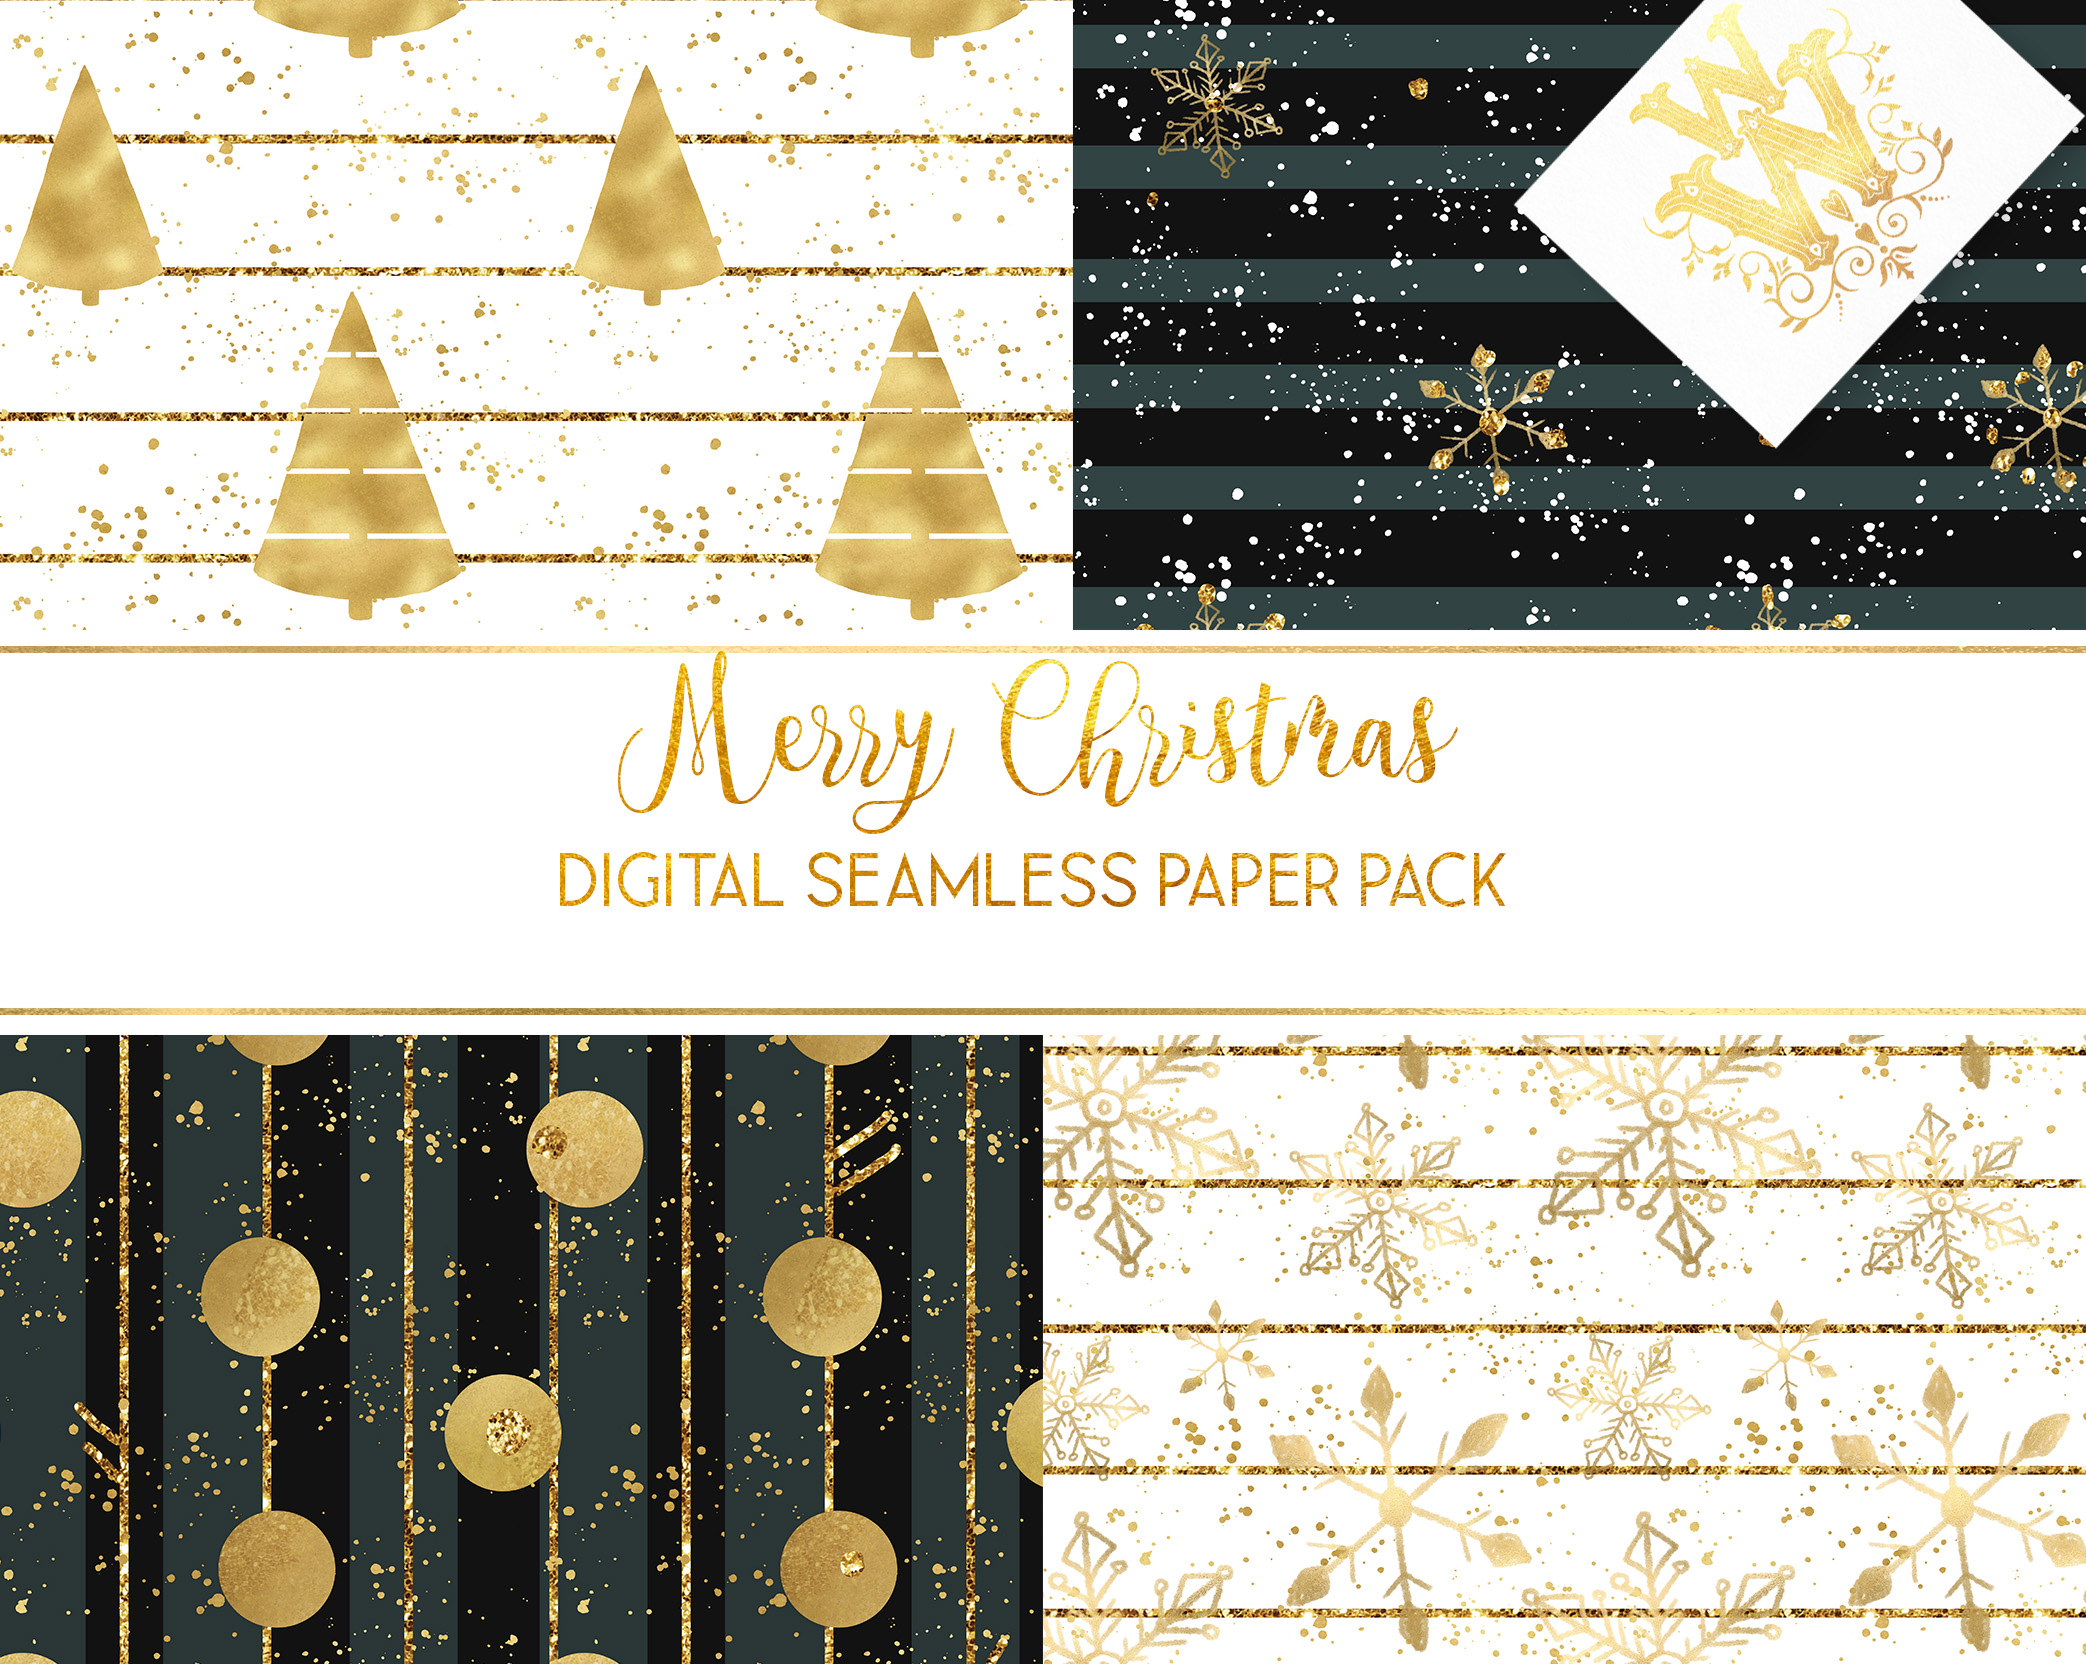 Christmas digital paper pack, seamless pattern snowflake example image 3